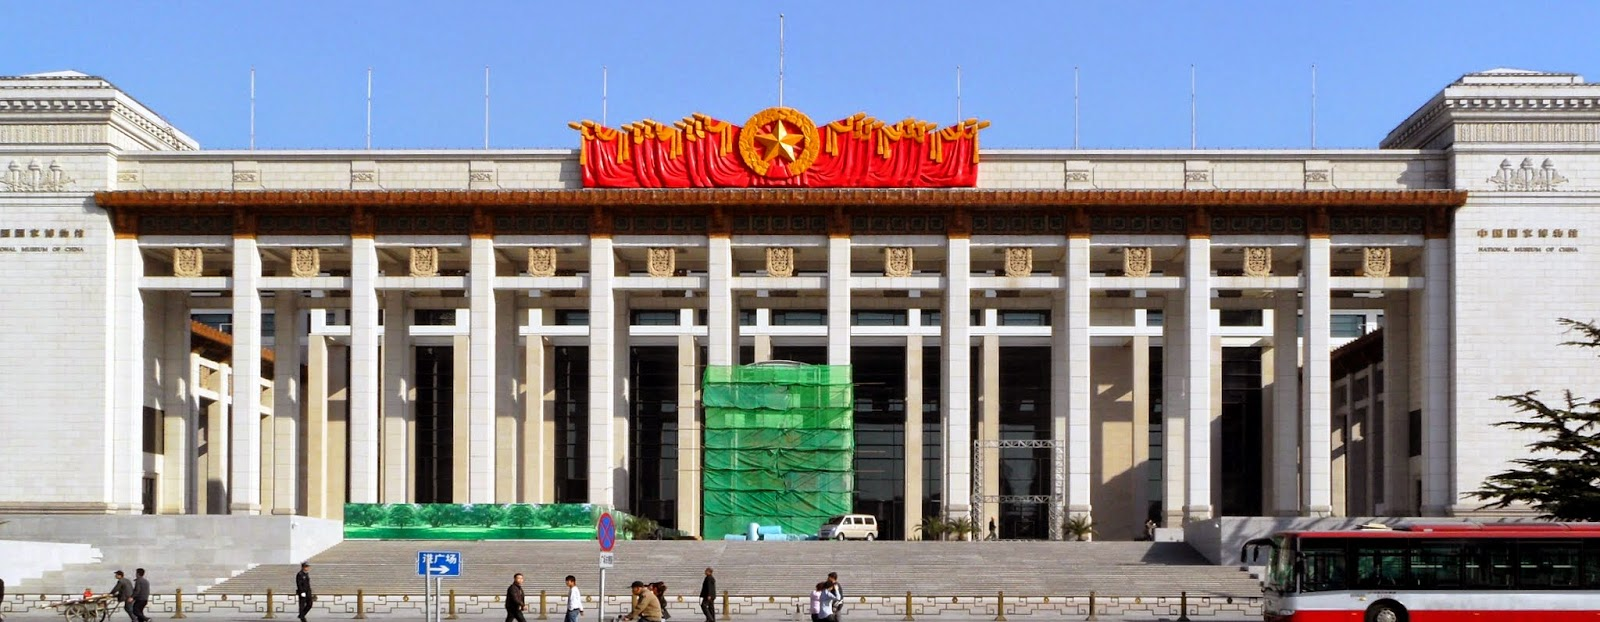 https://picasaweb.google.com/110534705729011664696/Beijing2010